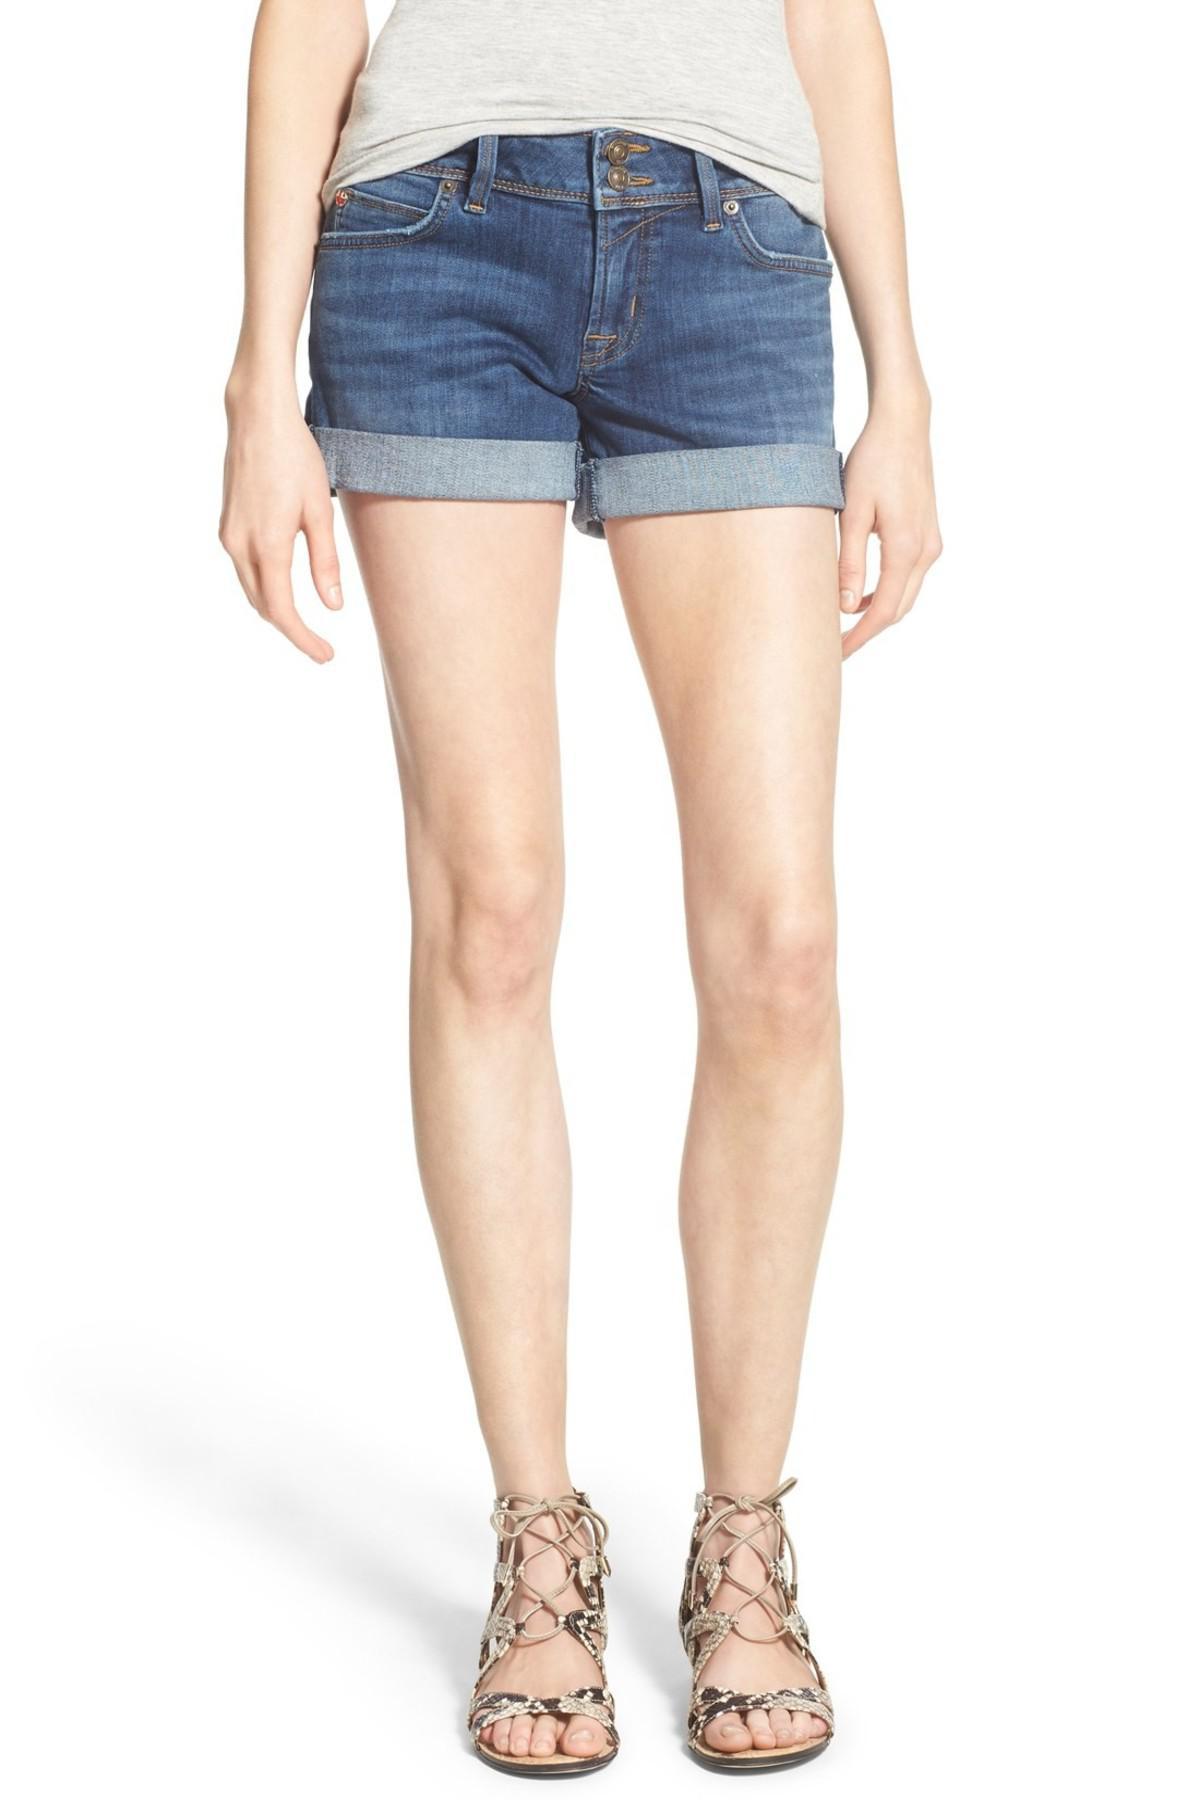 1d403f22e9 Lyst - Hudson Jeans 'croxley' Cuffed Denim Shorts (advantageous) in Blue